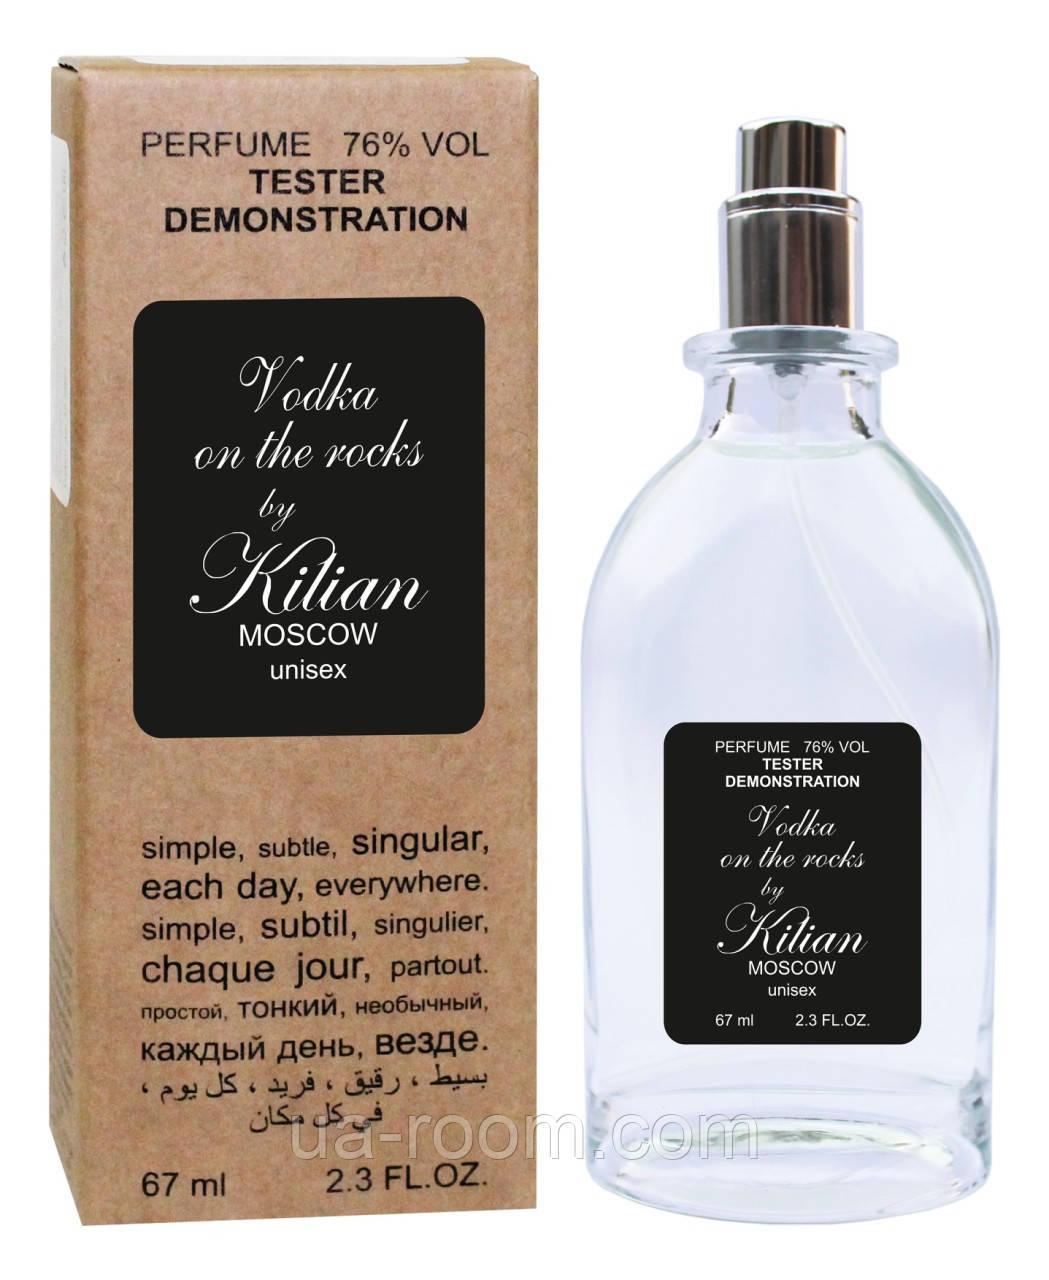 Тестер унисекс KILIAN Vodka on the rock's, 67 мл.